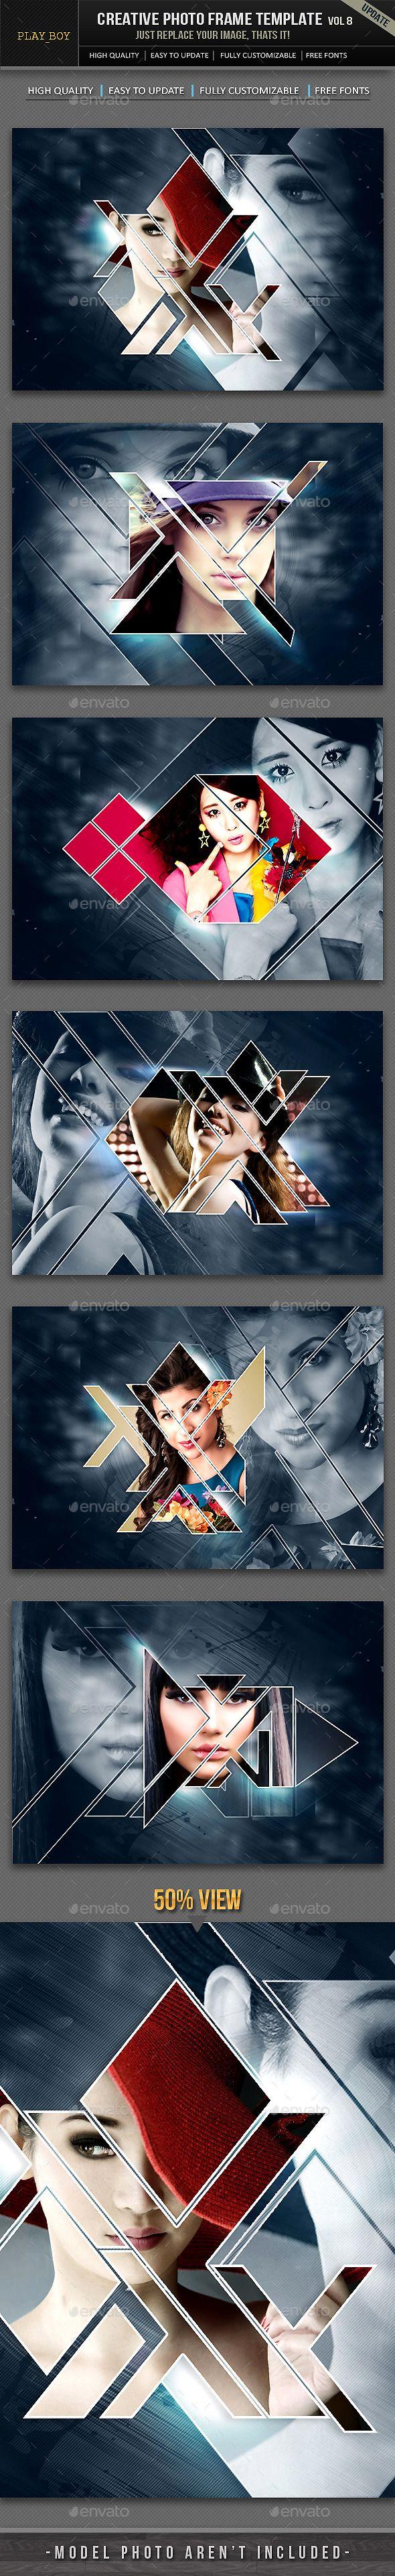 Creative Photo Frame Template PSD Download: http://graphicriver.net/item/creative-photo-frame-template/11467324?ref=ksioks